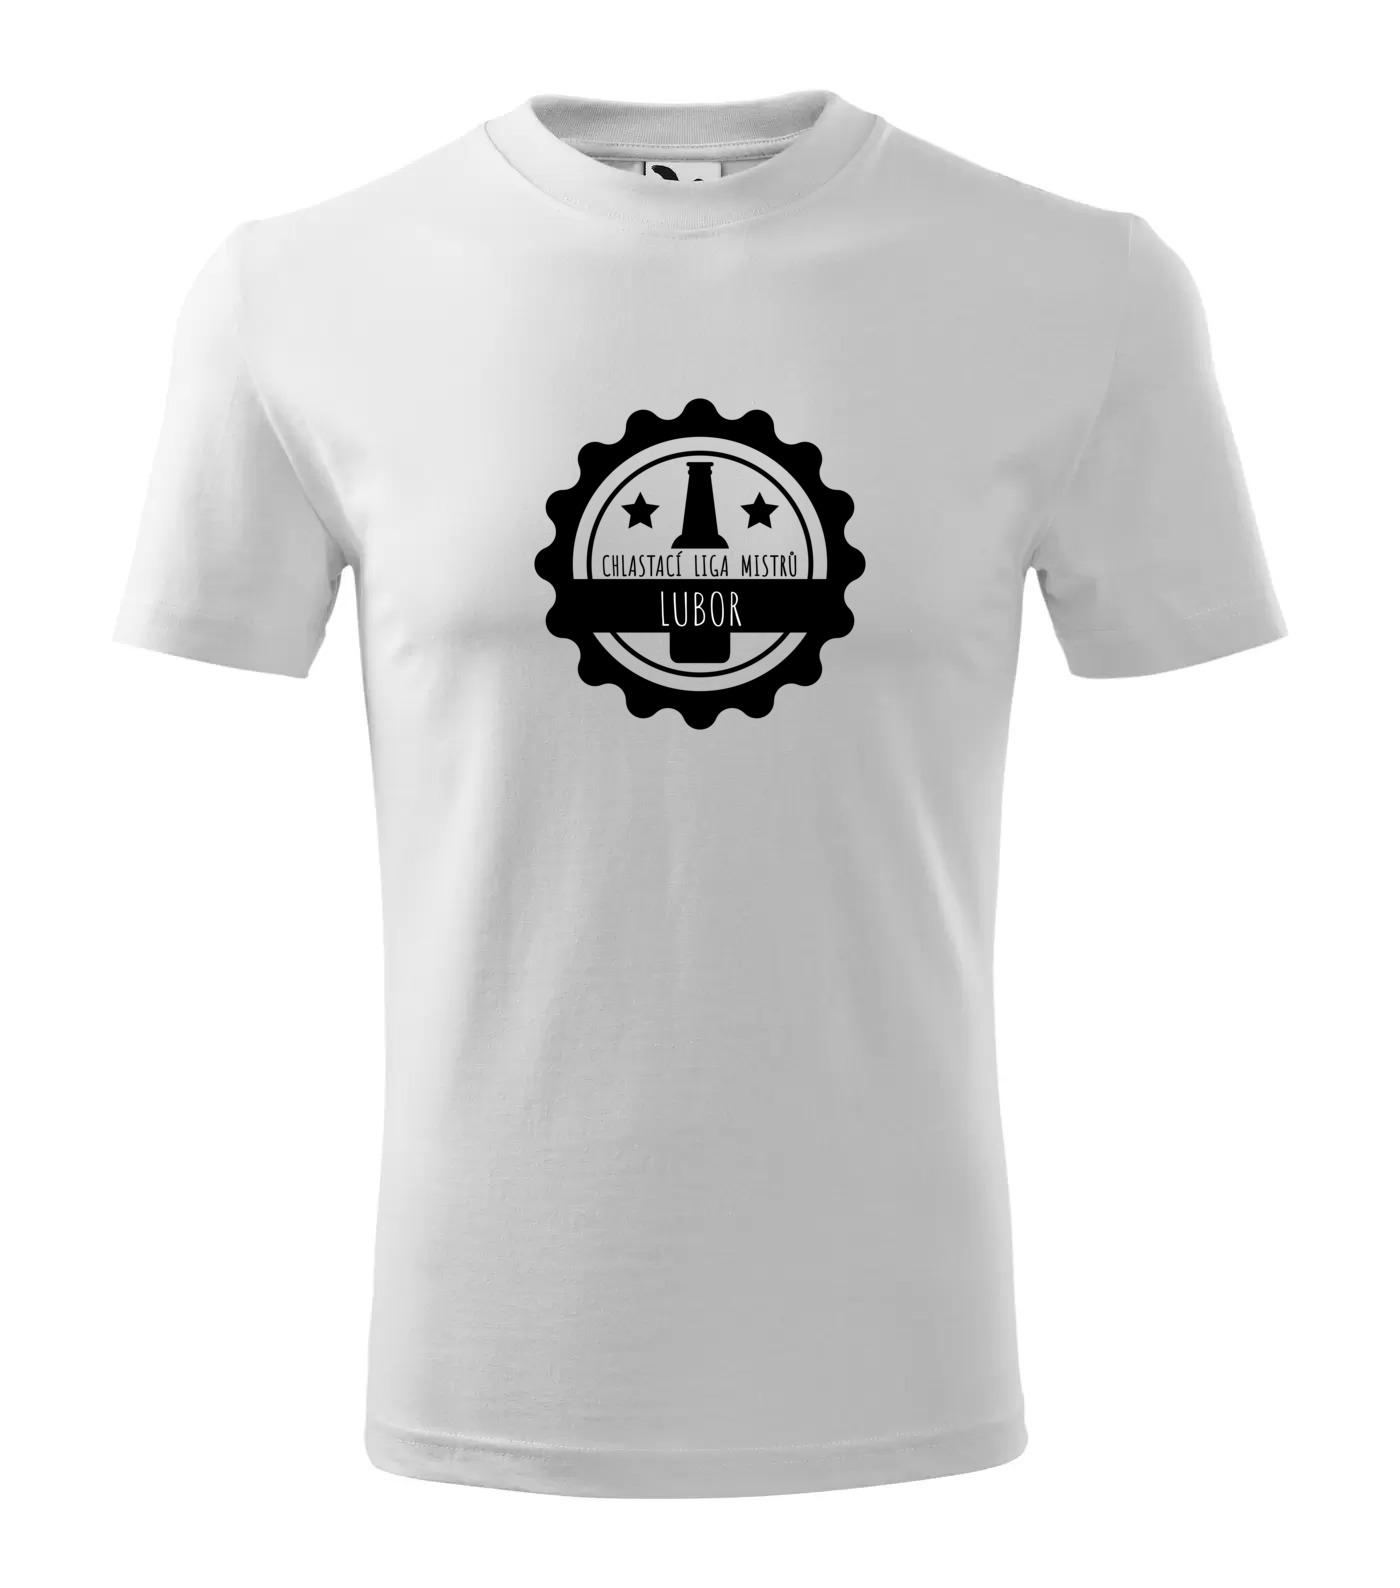 Tričko Chlastací liga mužů Lubor